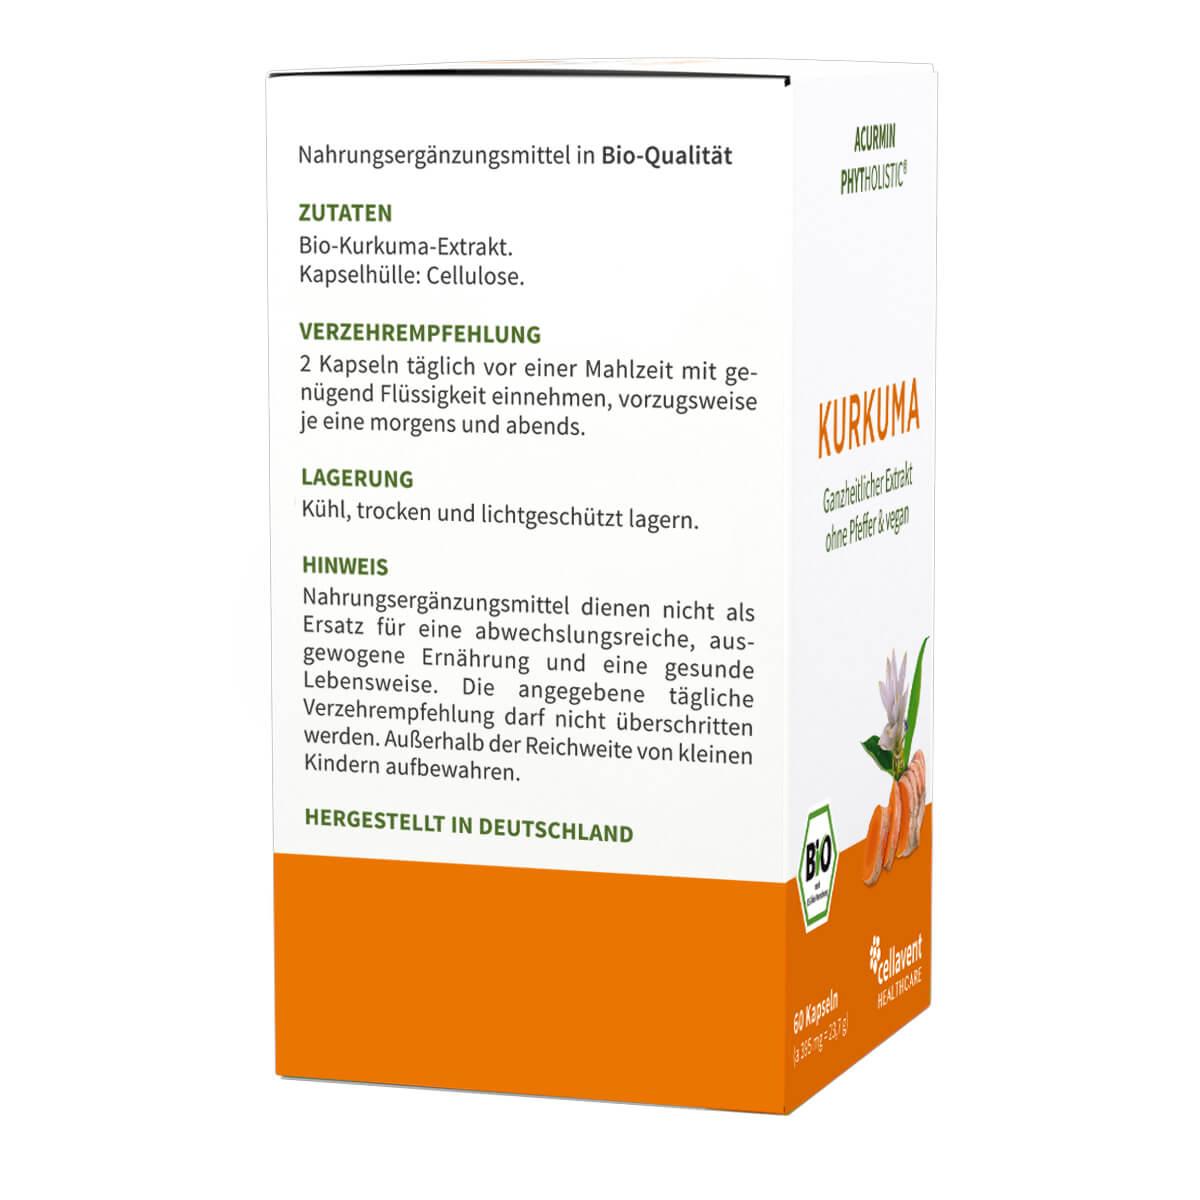 kurkuma-kapseln-bio-acurmin-phytholistic-60-stueck-verpackung-links-1200x1200